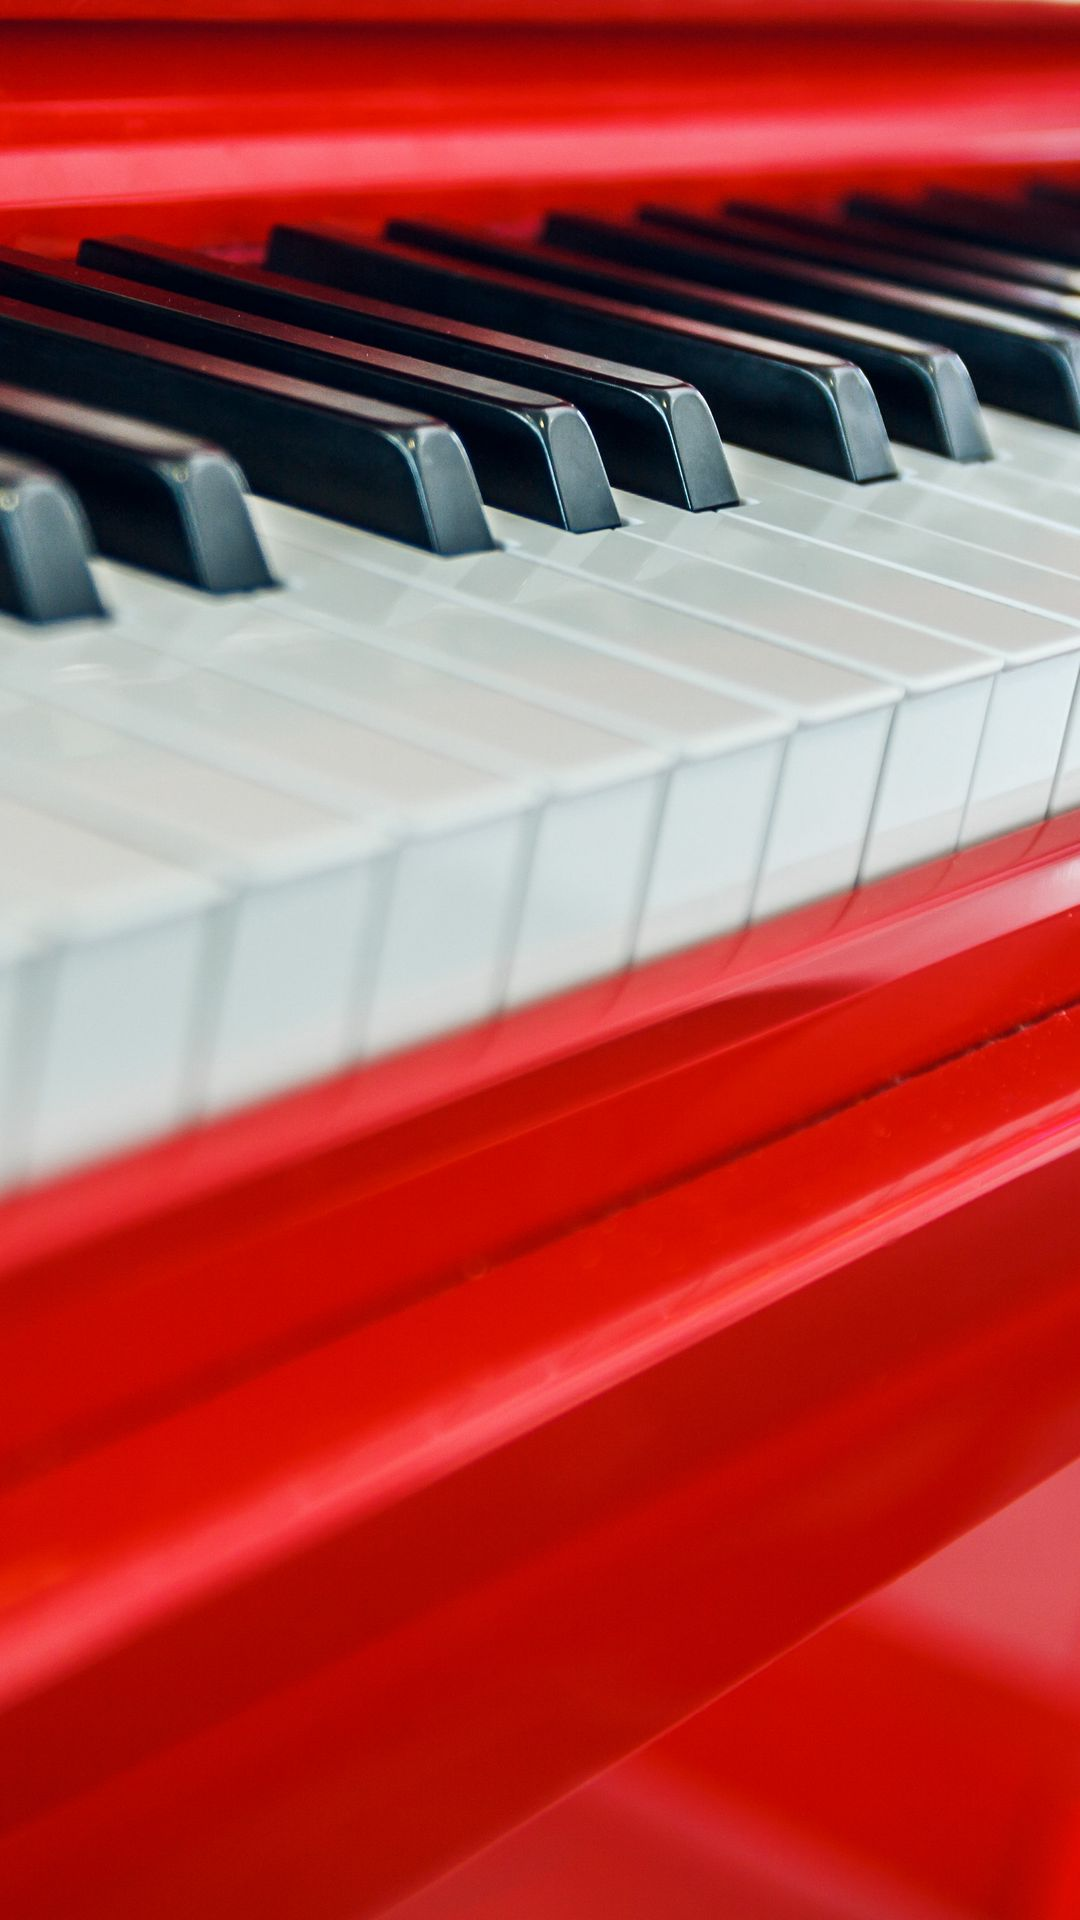 Red Piano Wallpaper